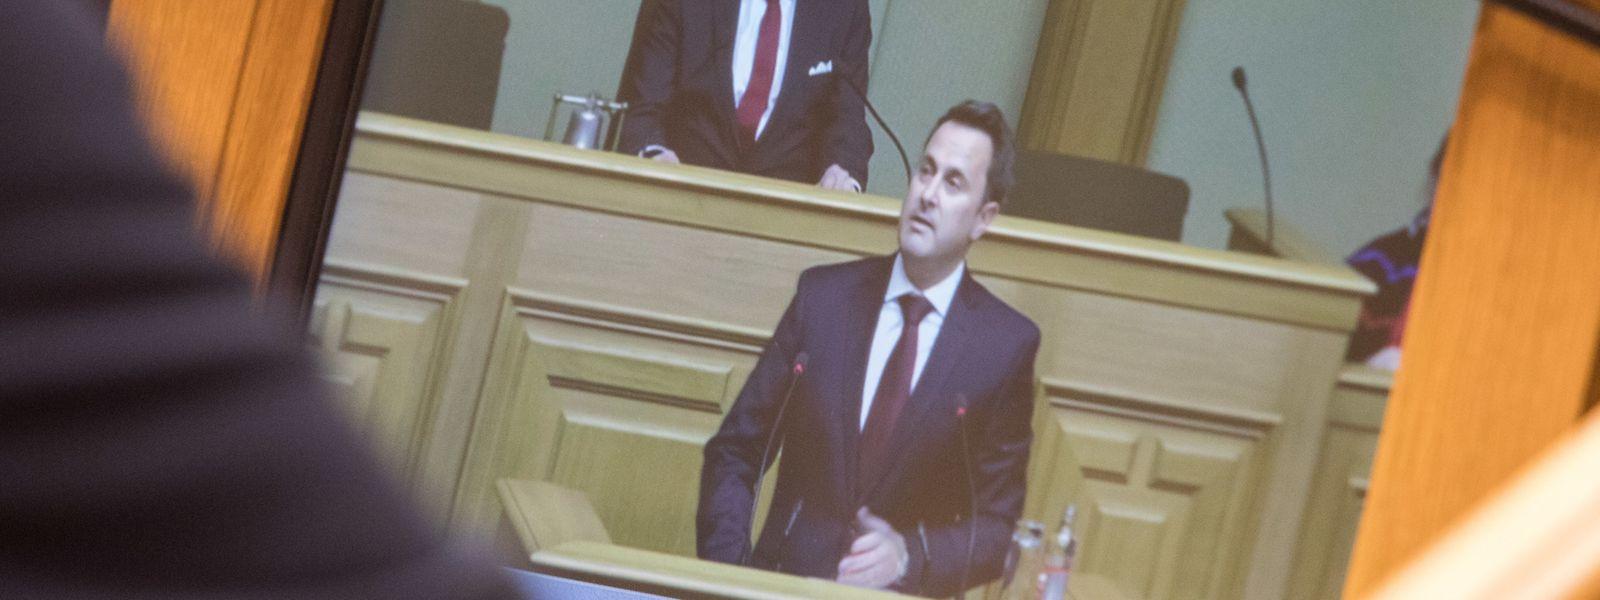 Xavier Bettel stellt das Koaltionsabkommen im Parlament vor.